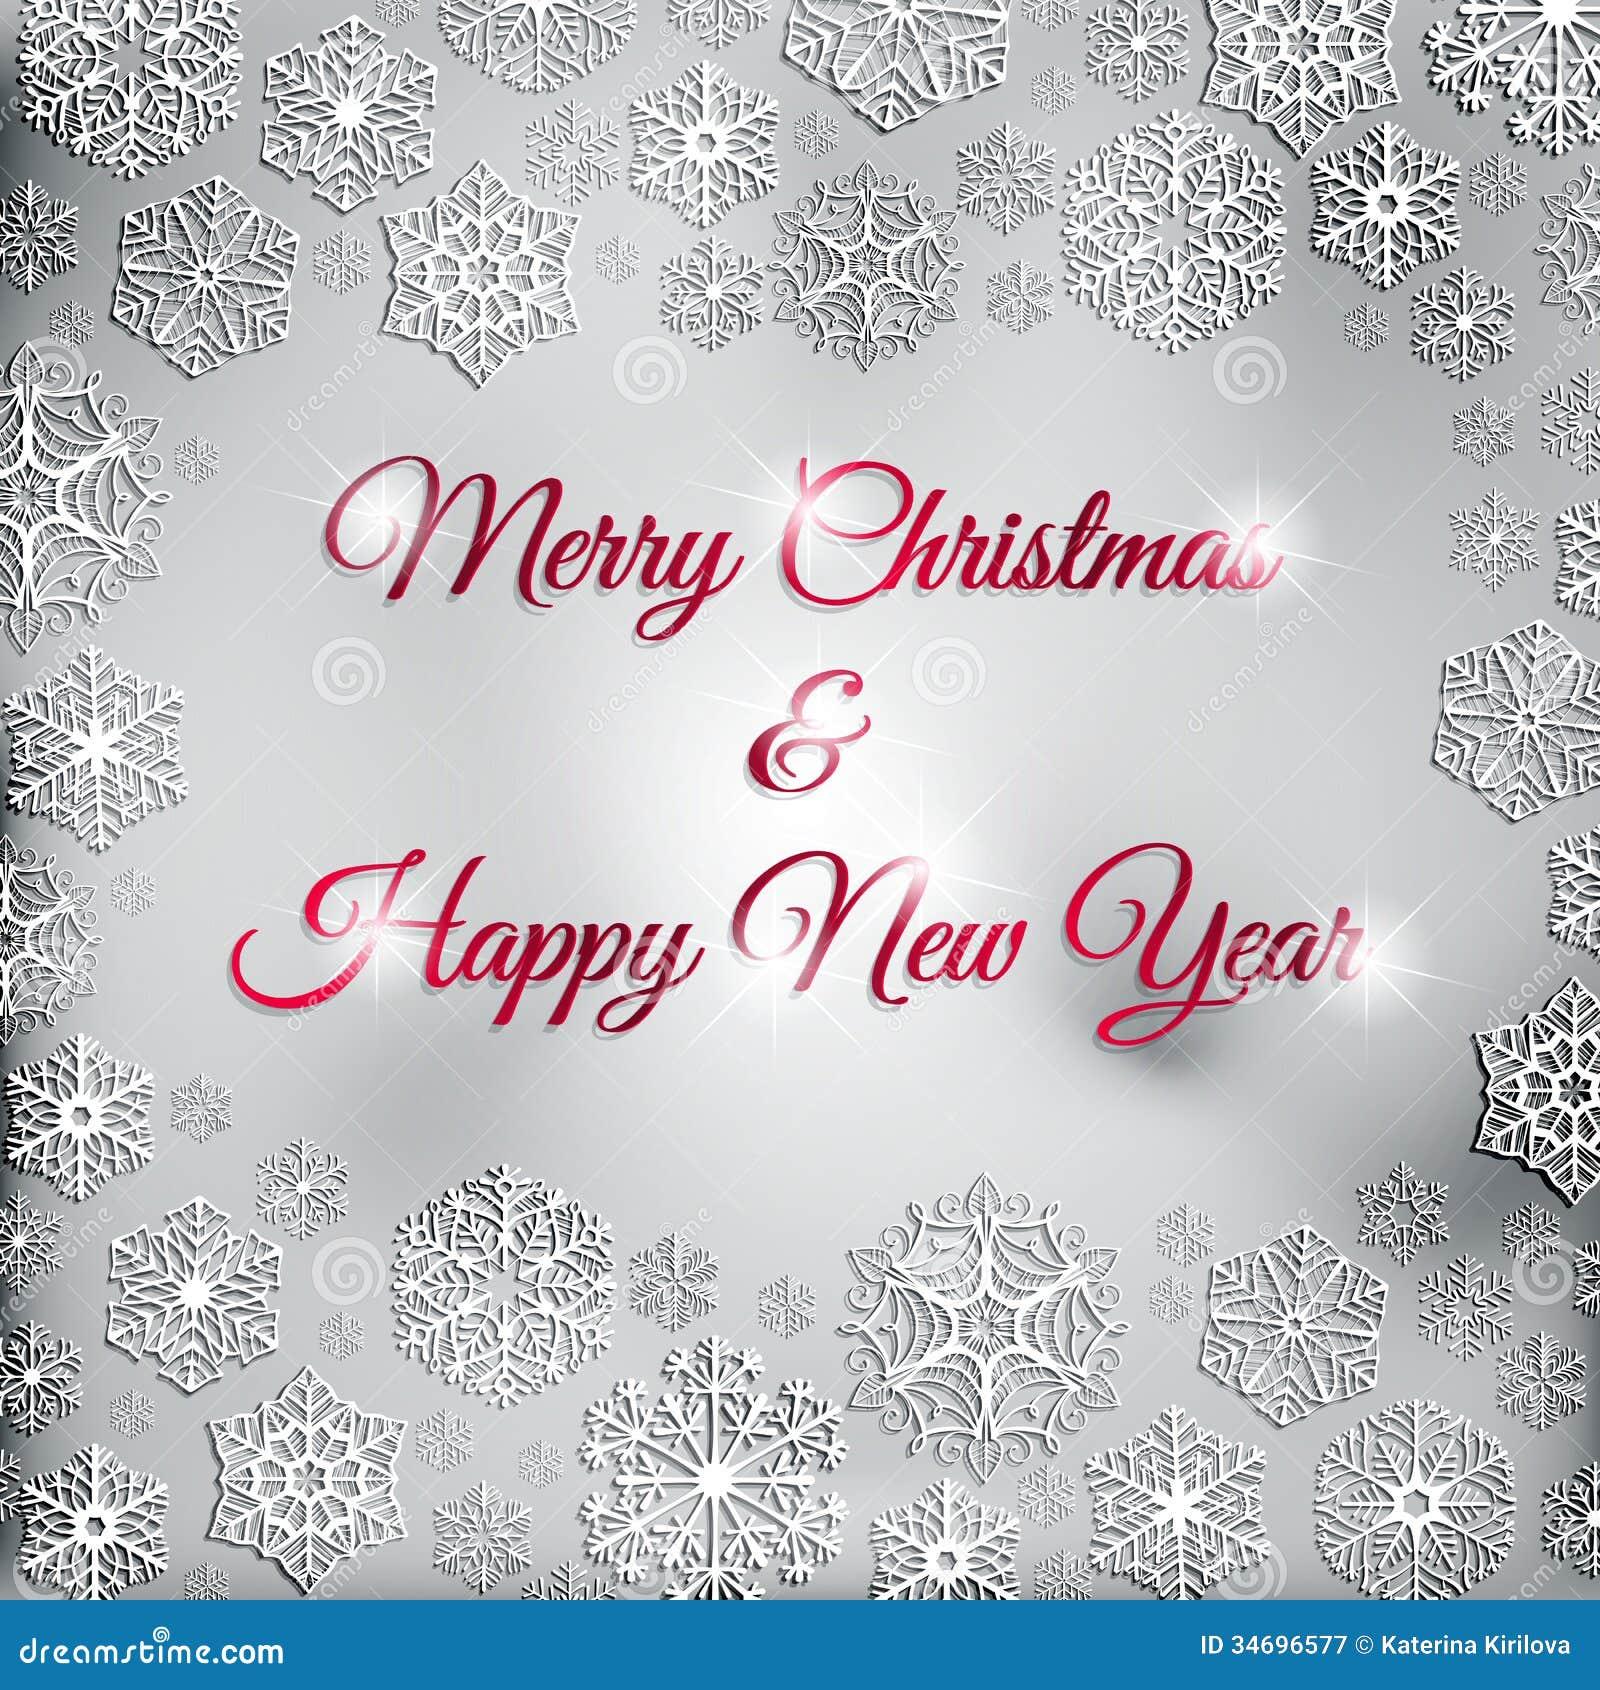 Christmas Menu Clipart